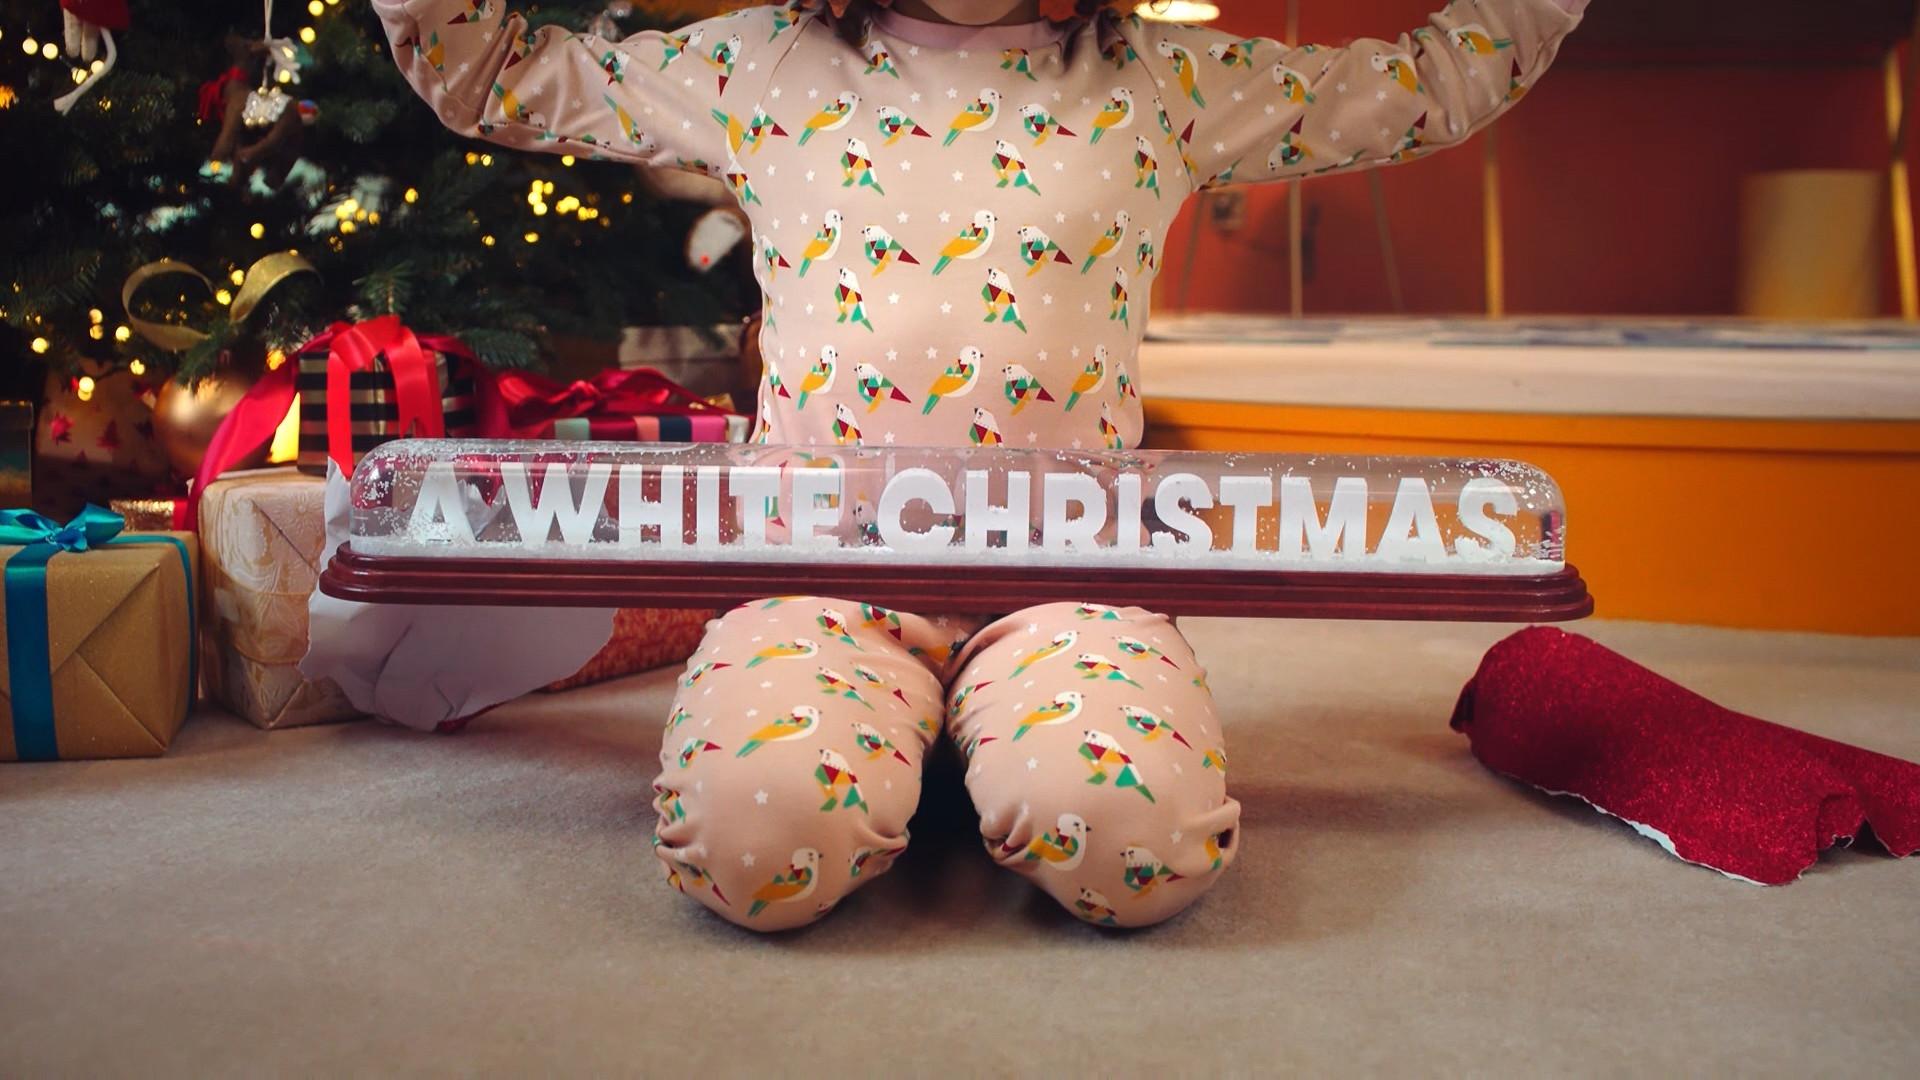 TK Maxx - White Christmas_1-0015